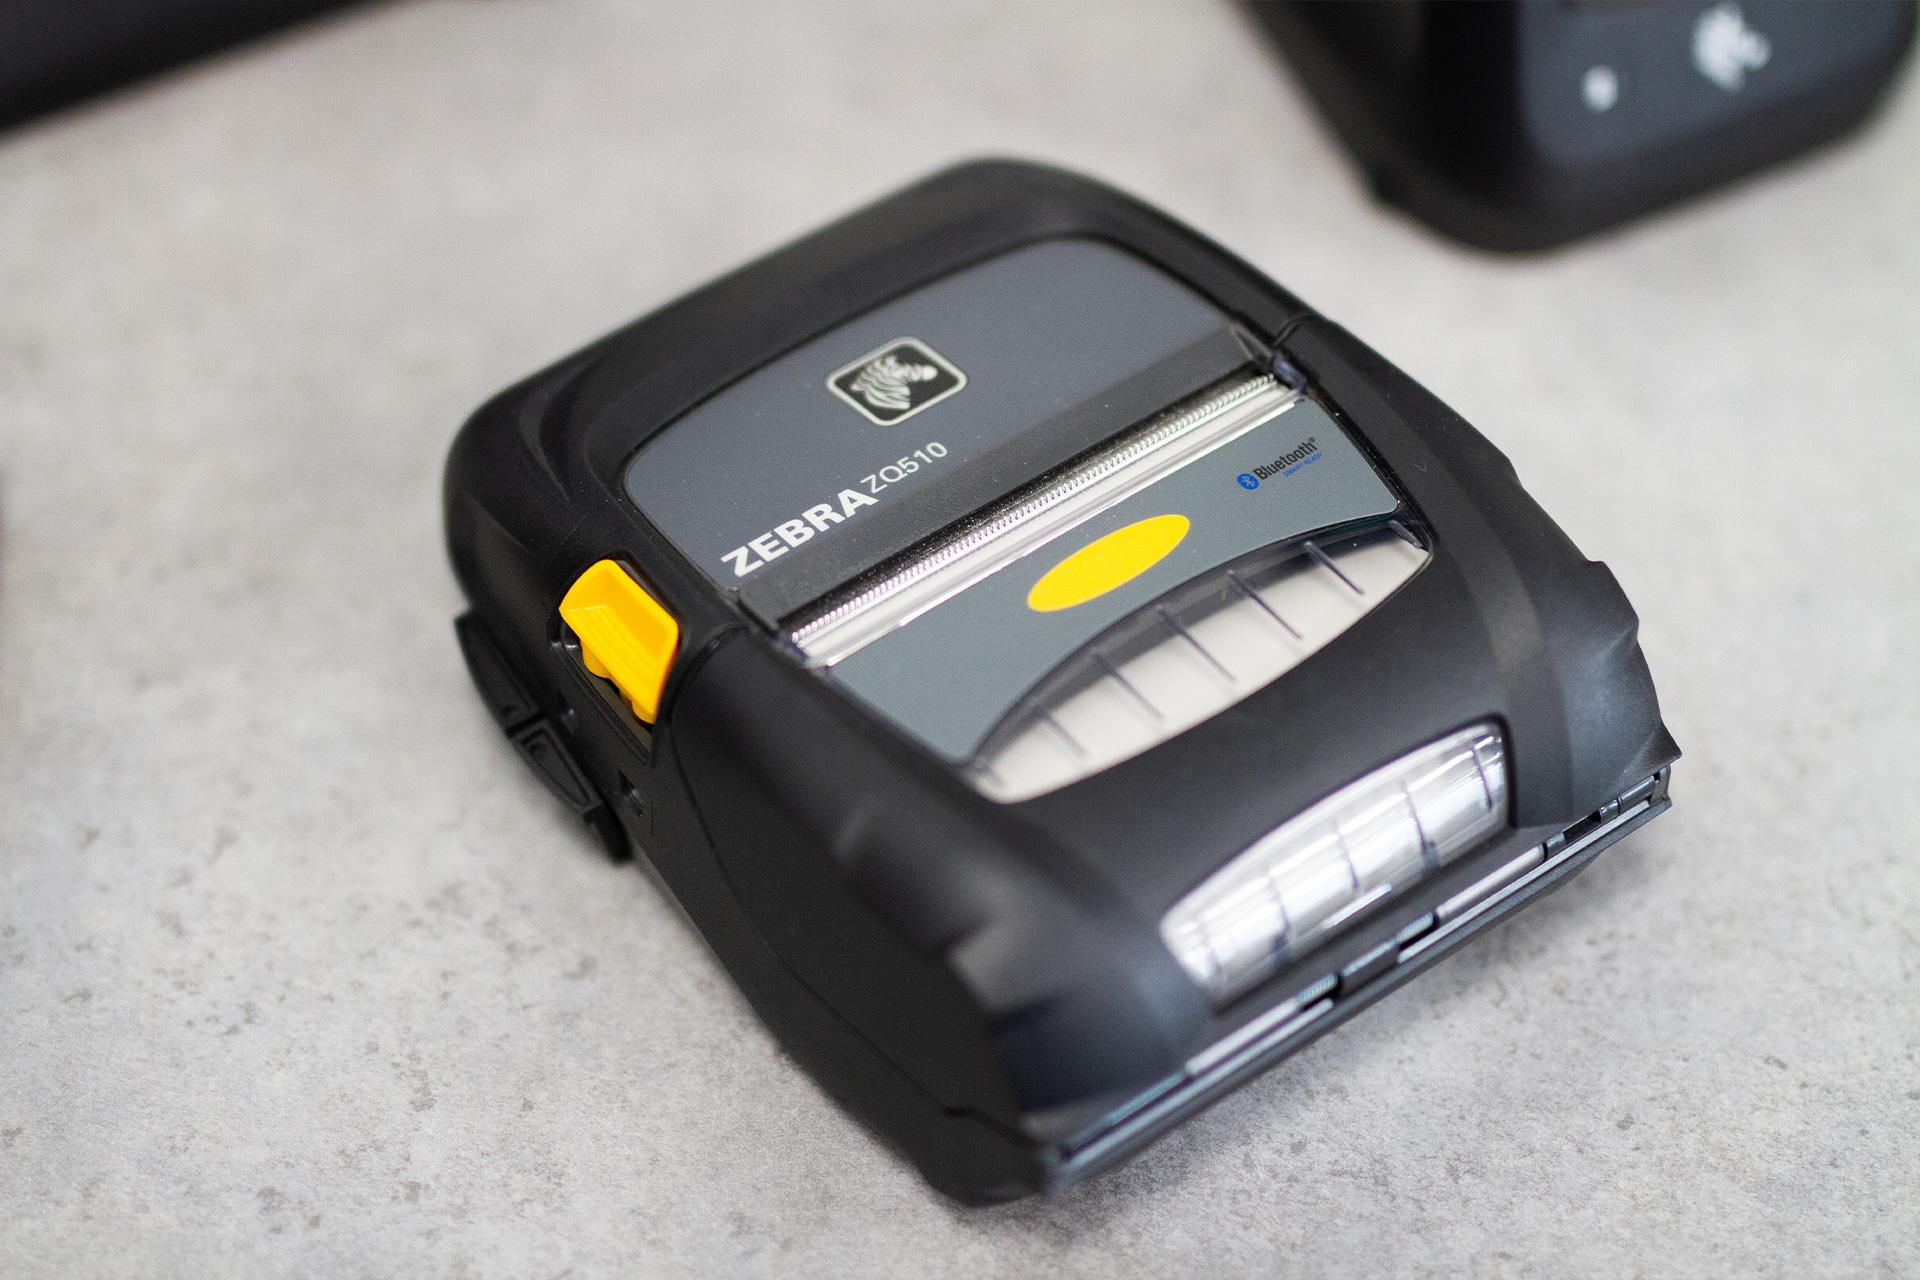 demo device